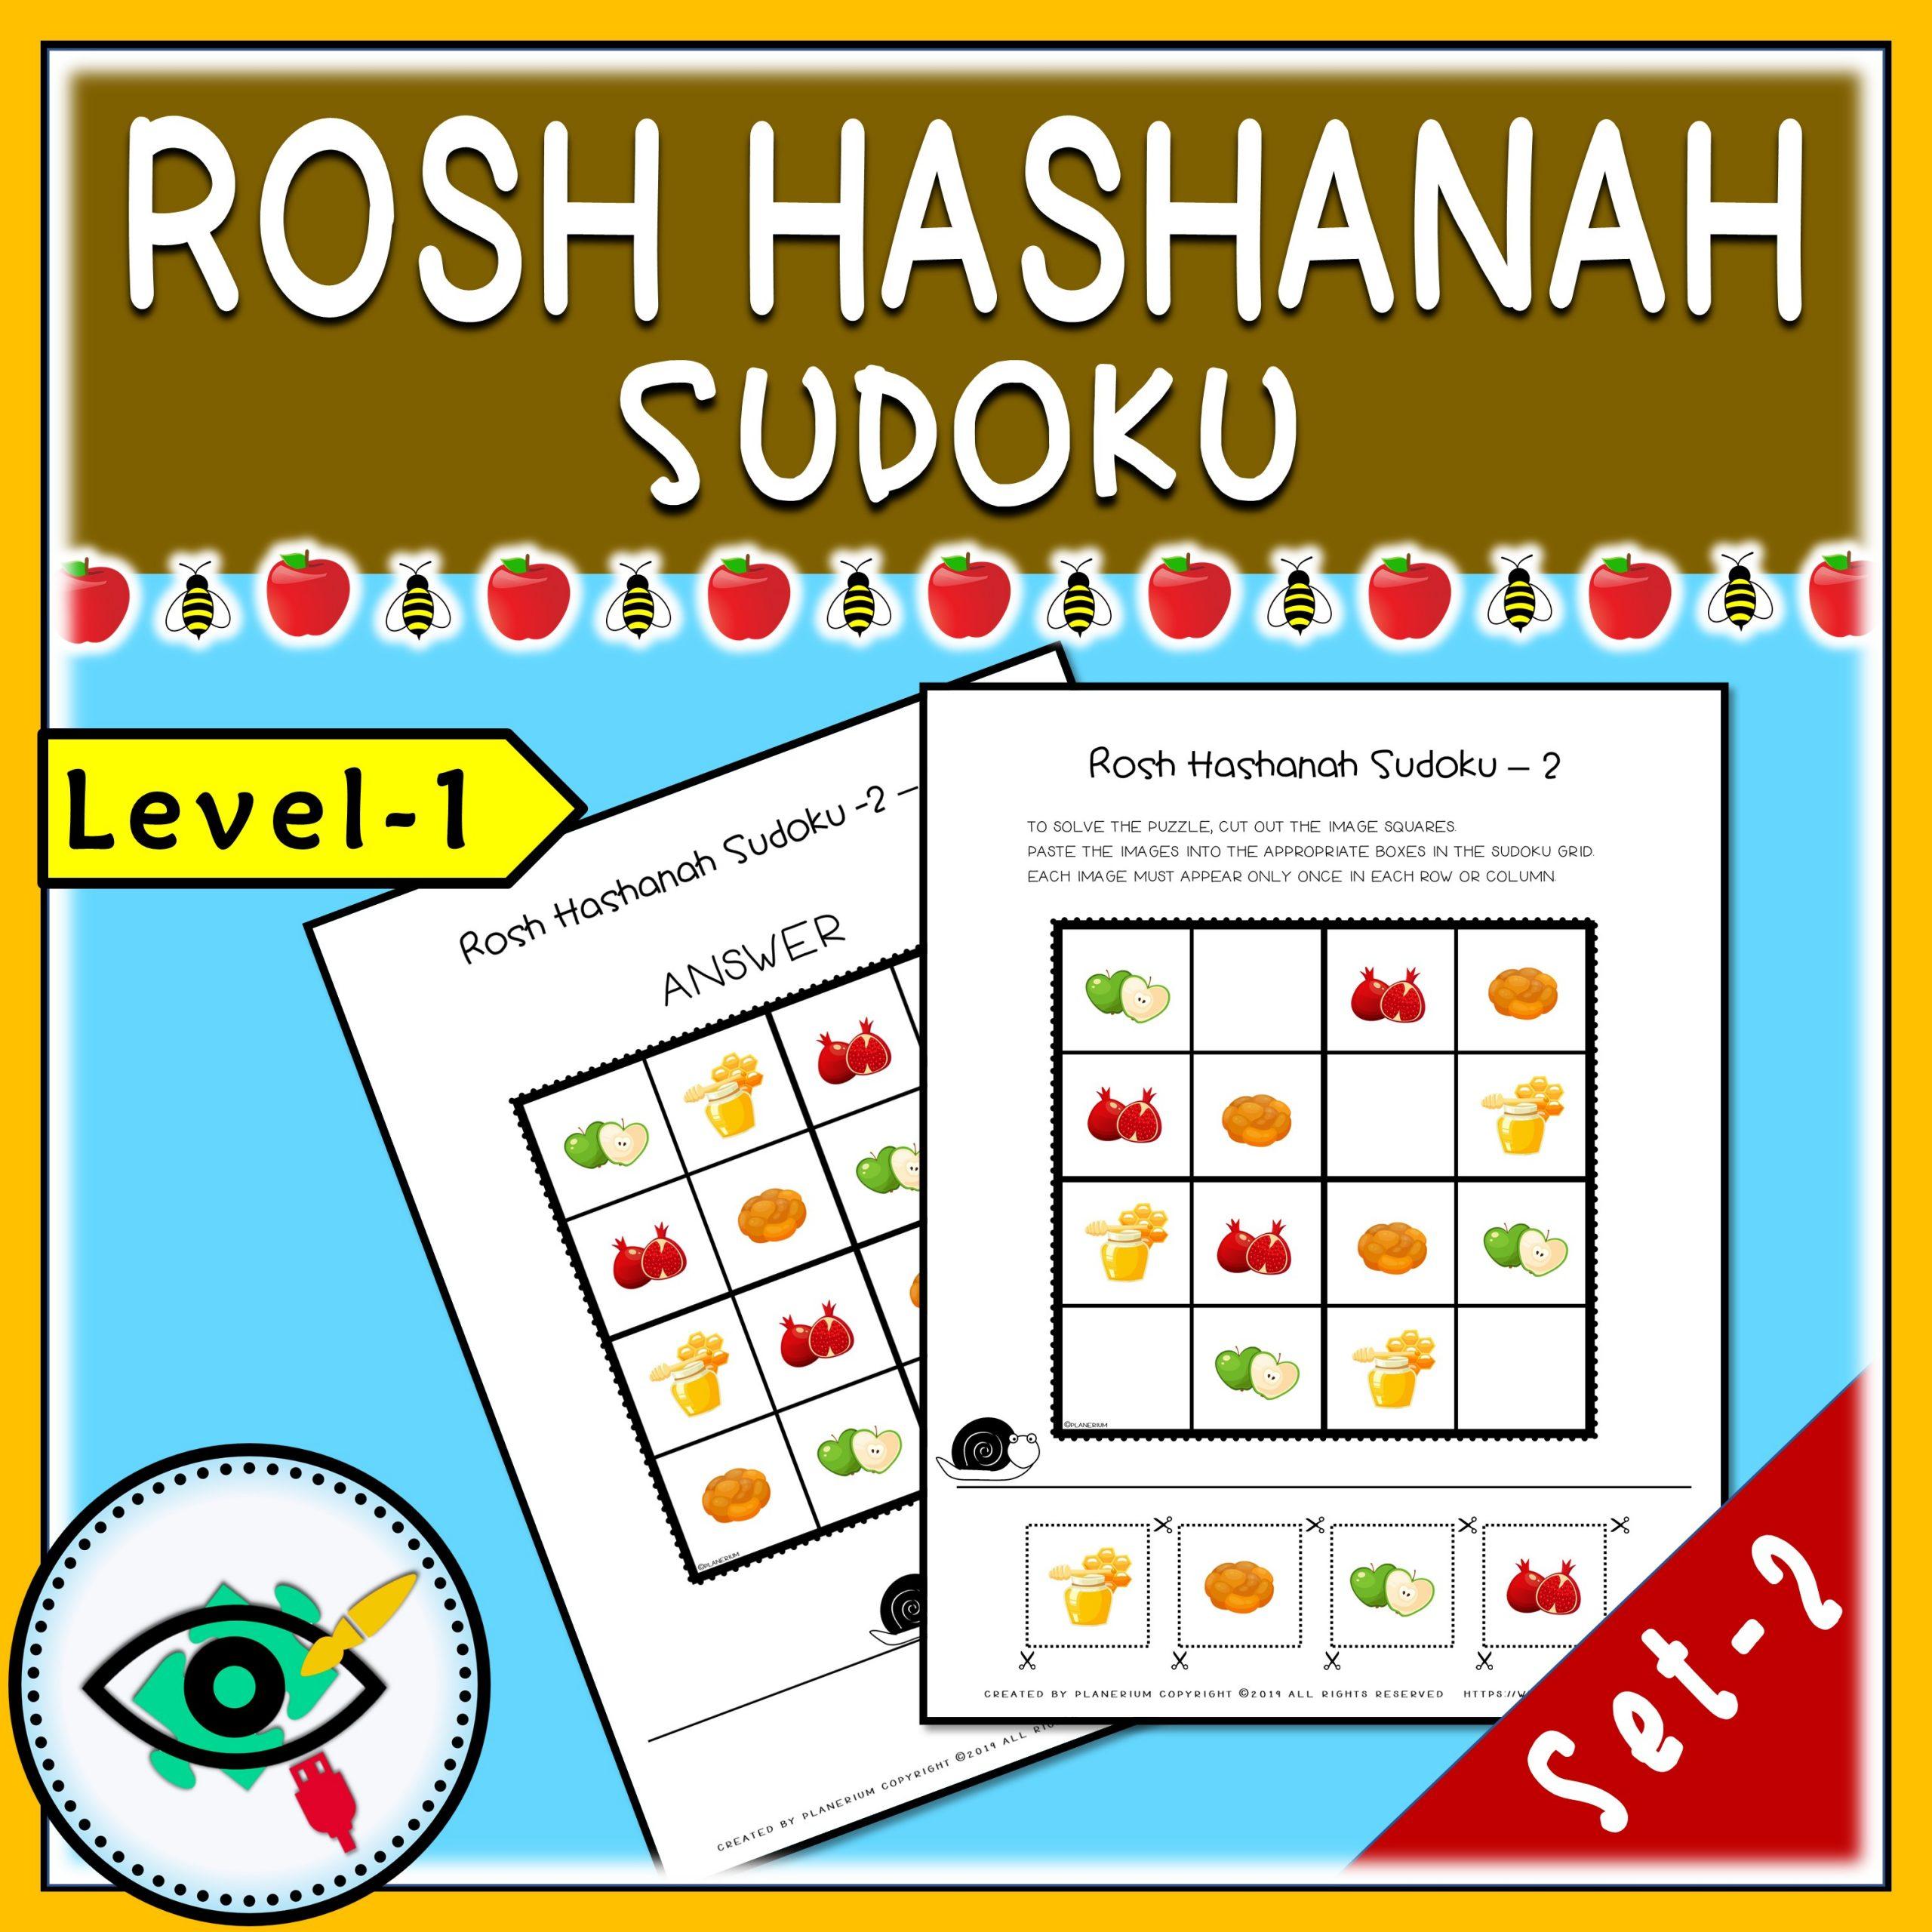 Rosh-Hashanah - Sudoku Puzzle - Title 4